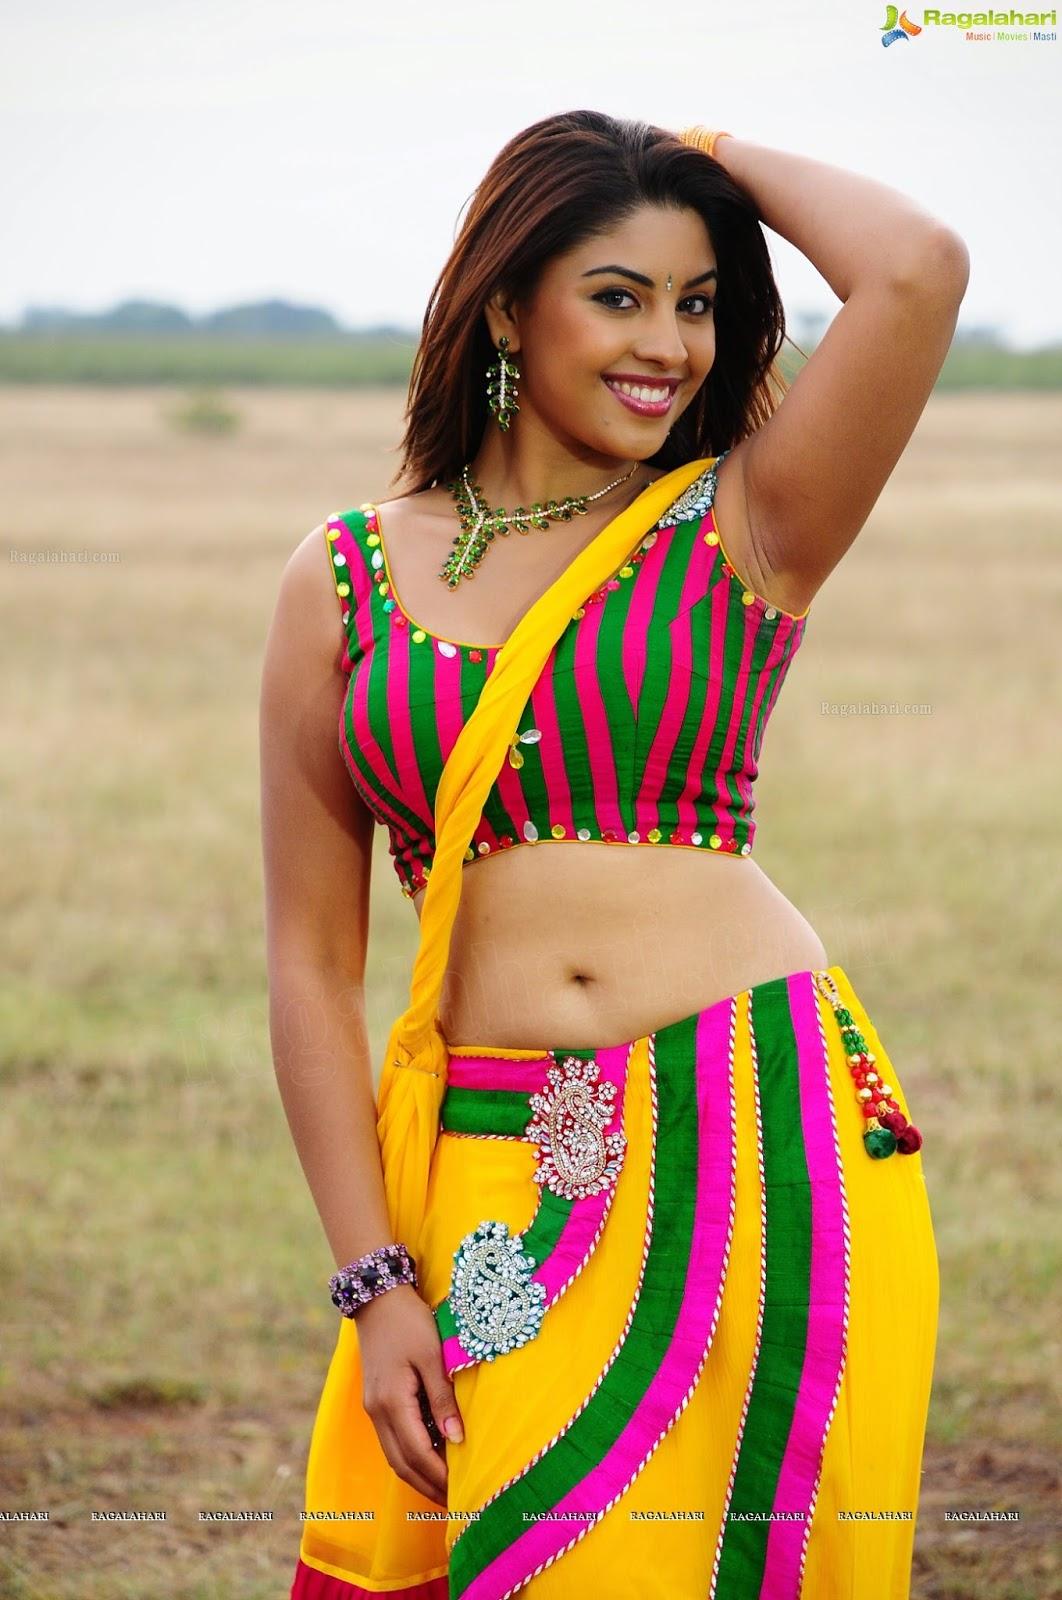 richa gangopadhyay hd hot in saree richa gangopadhyay spicy armpit photos tamilkacheri